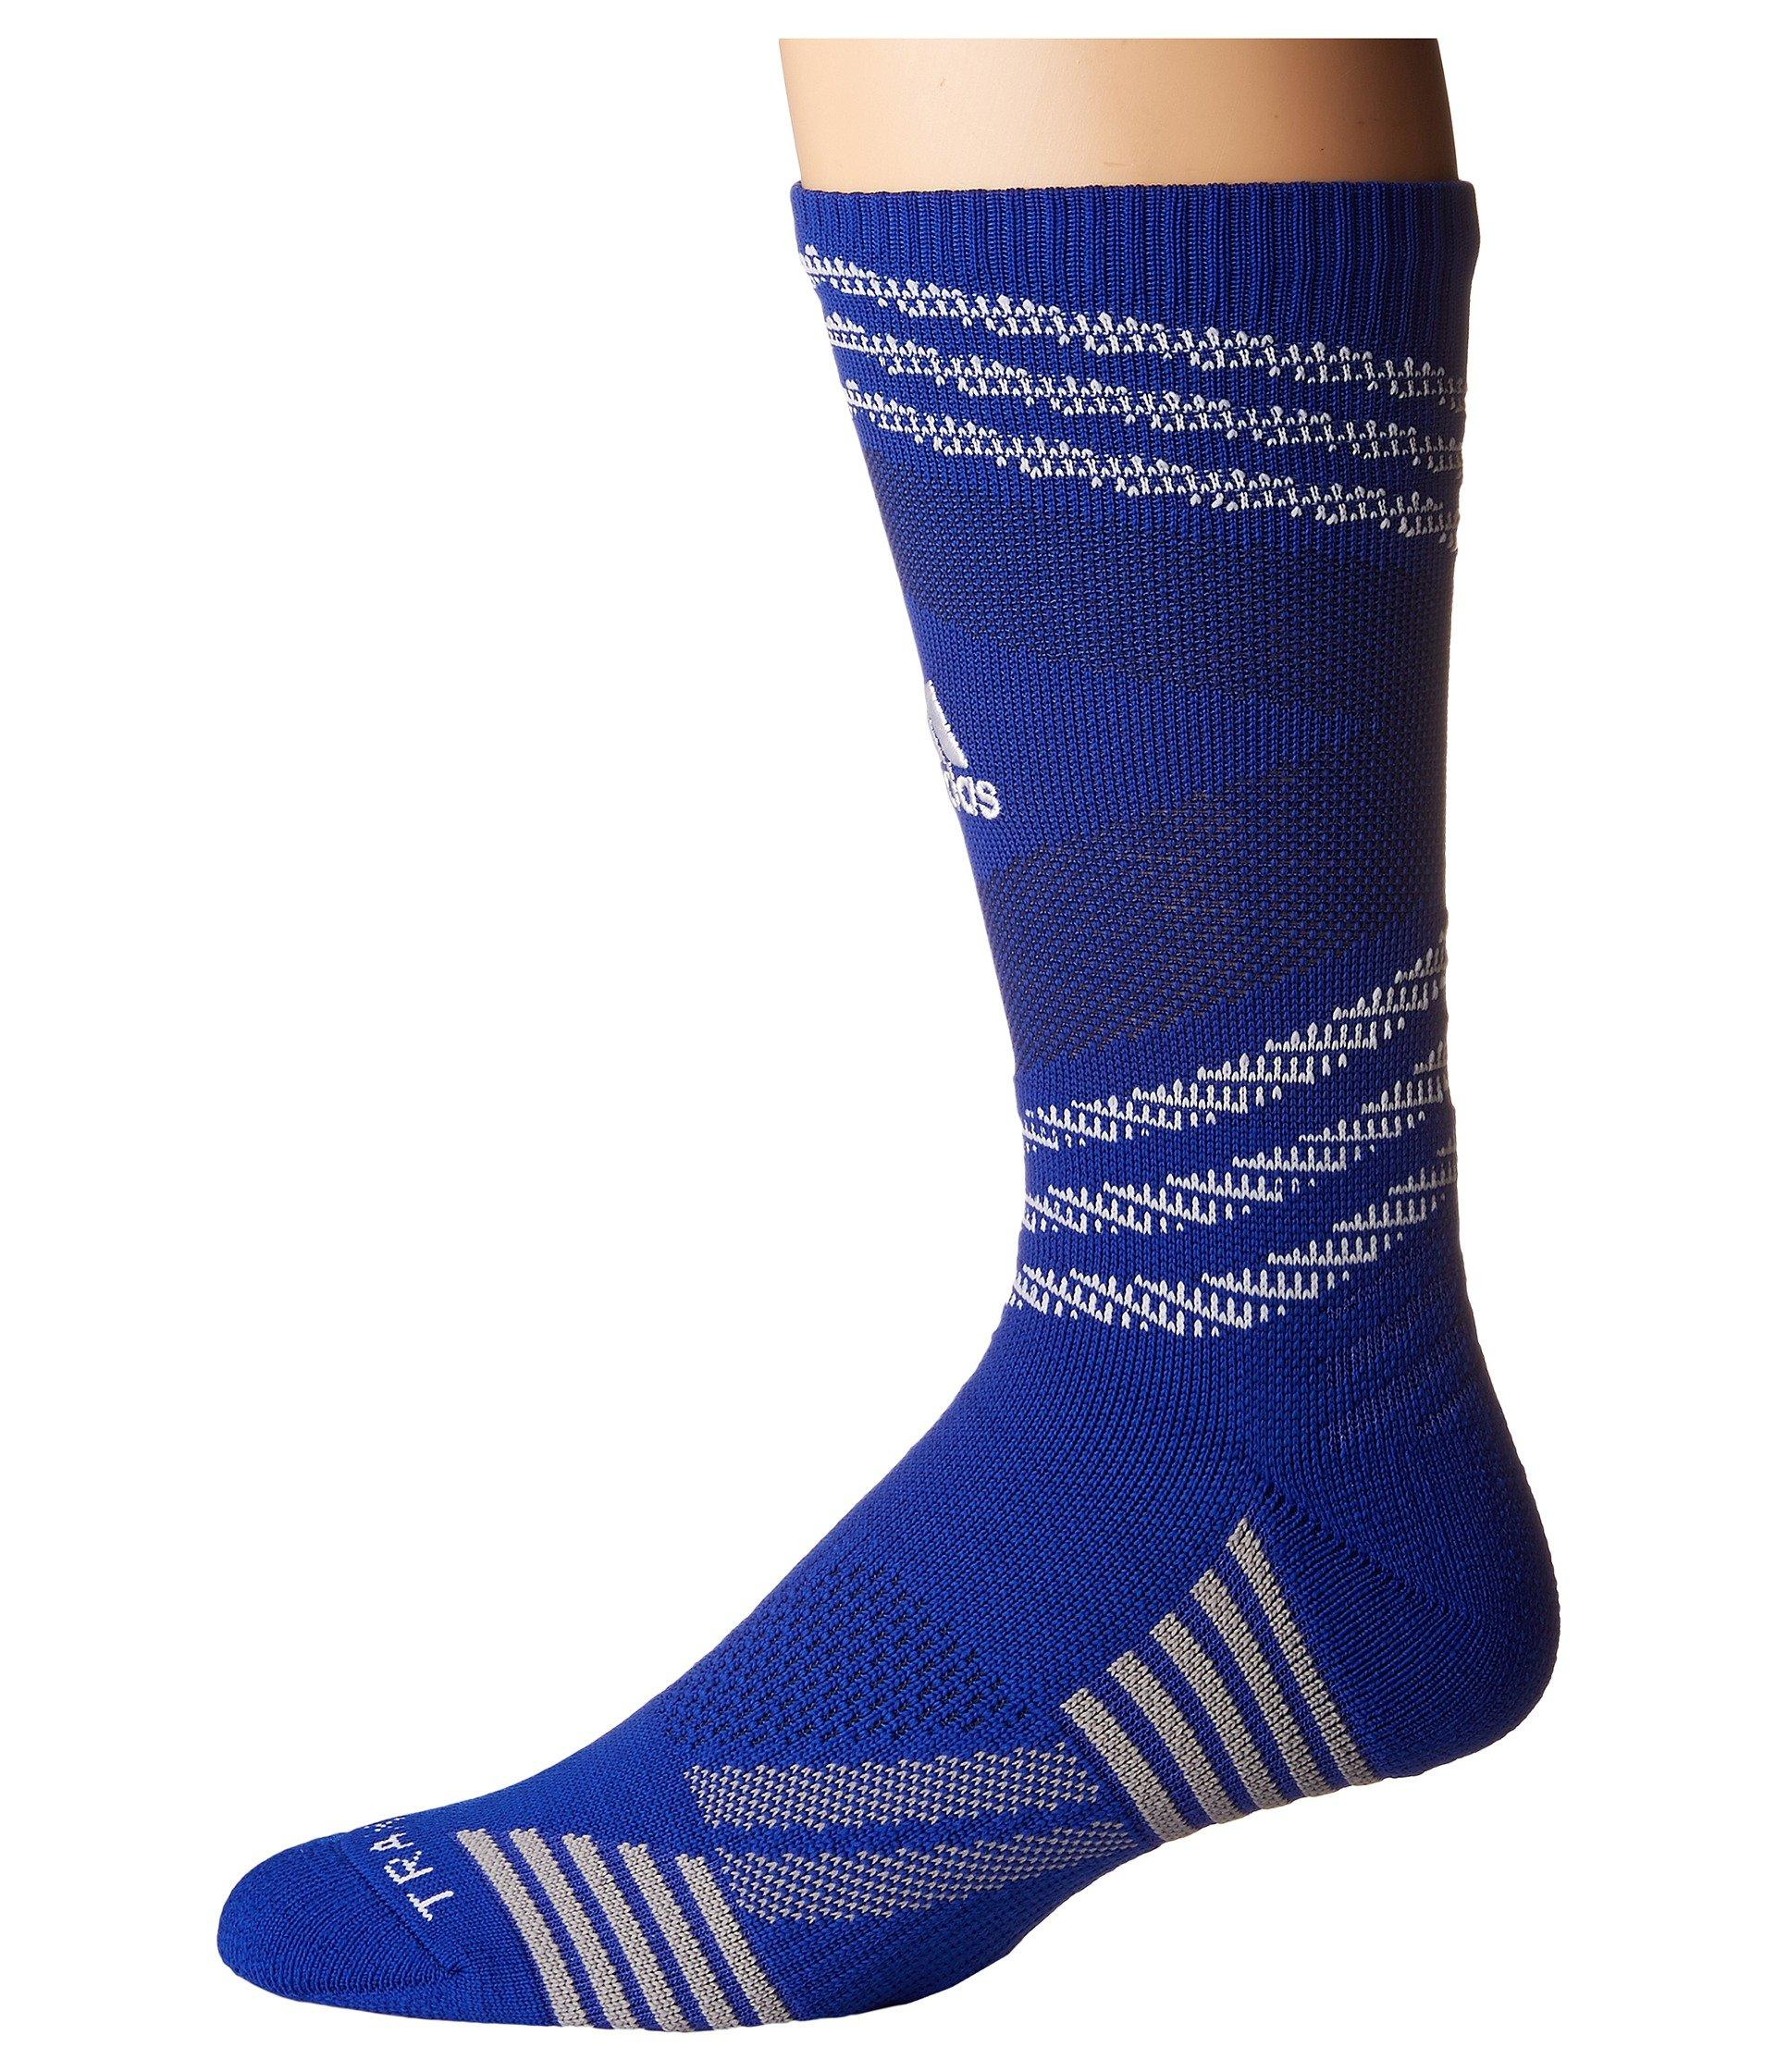 Speed Mesh Team Crew Socks in Bold BlueWhiteUnity Ink PurpleLight Onix